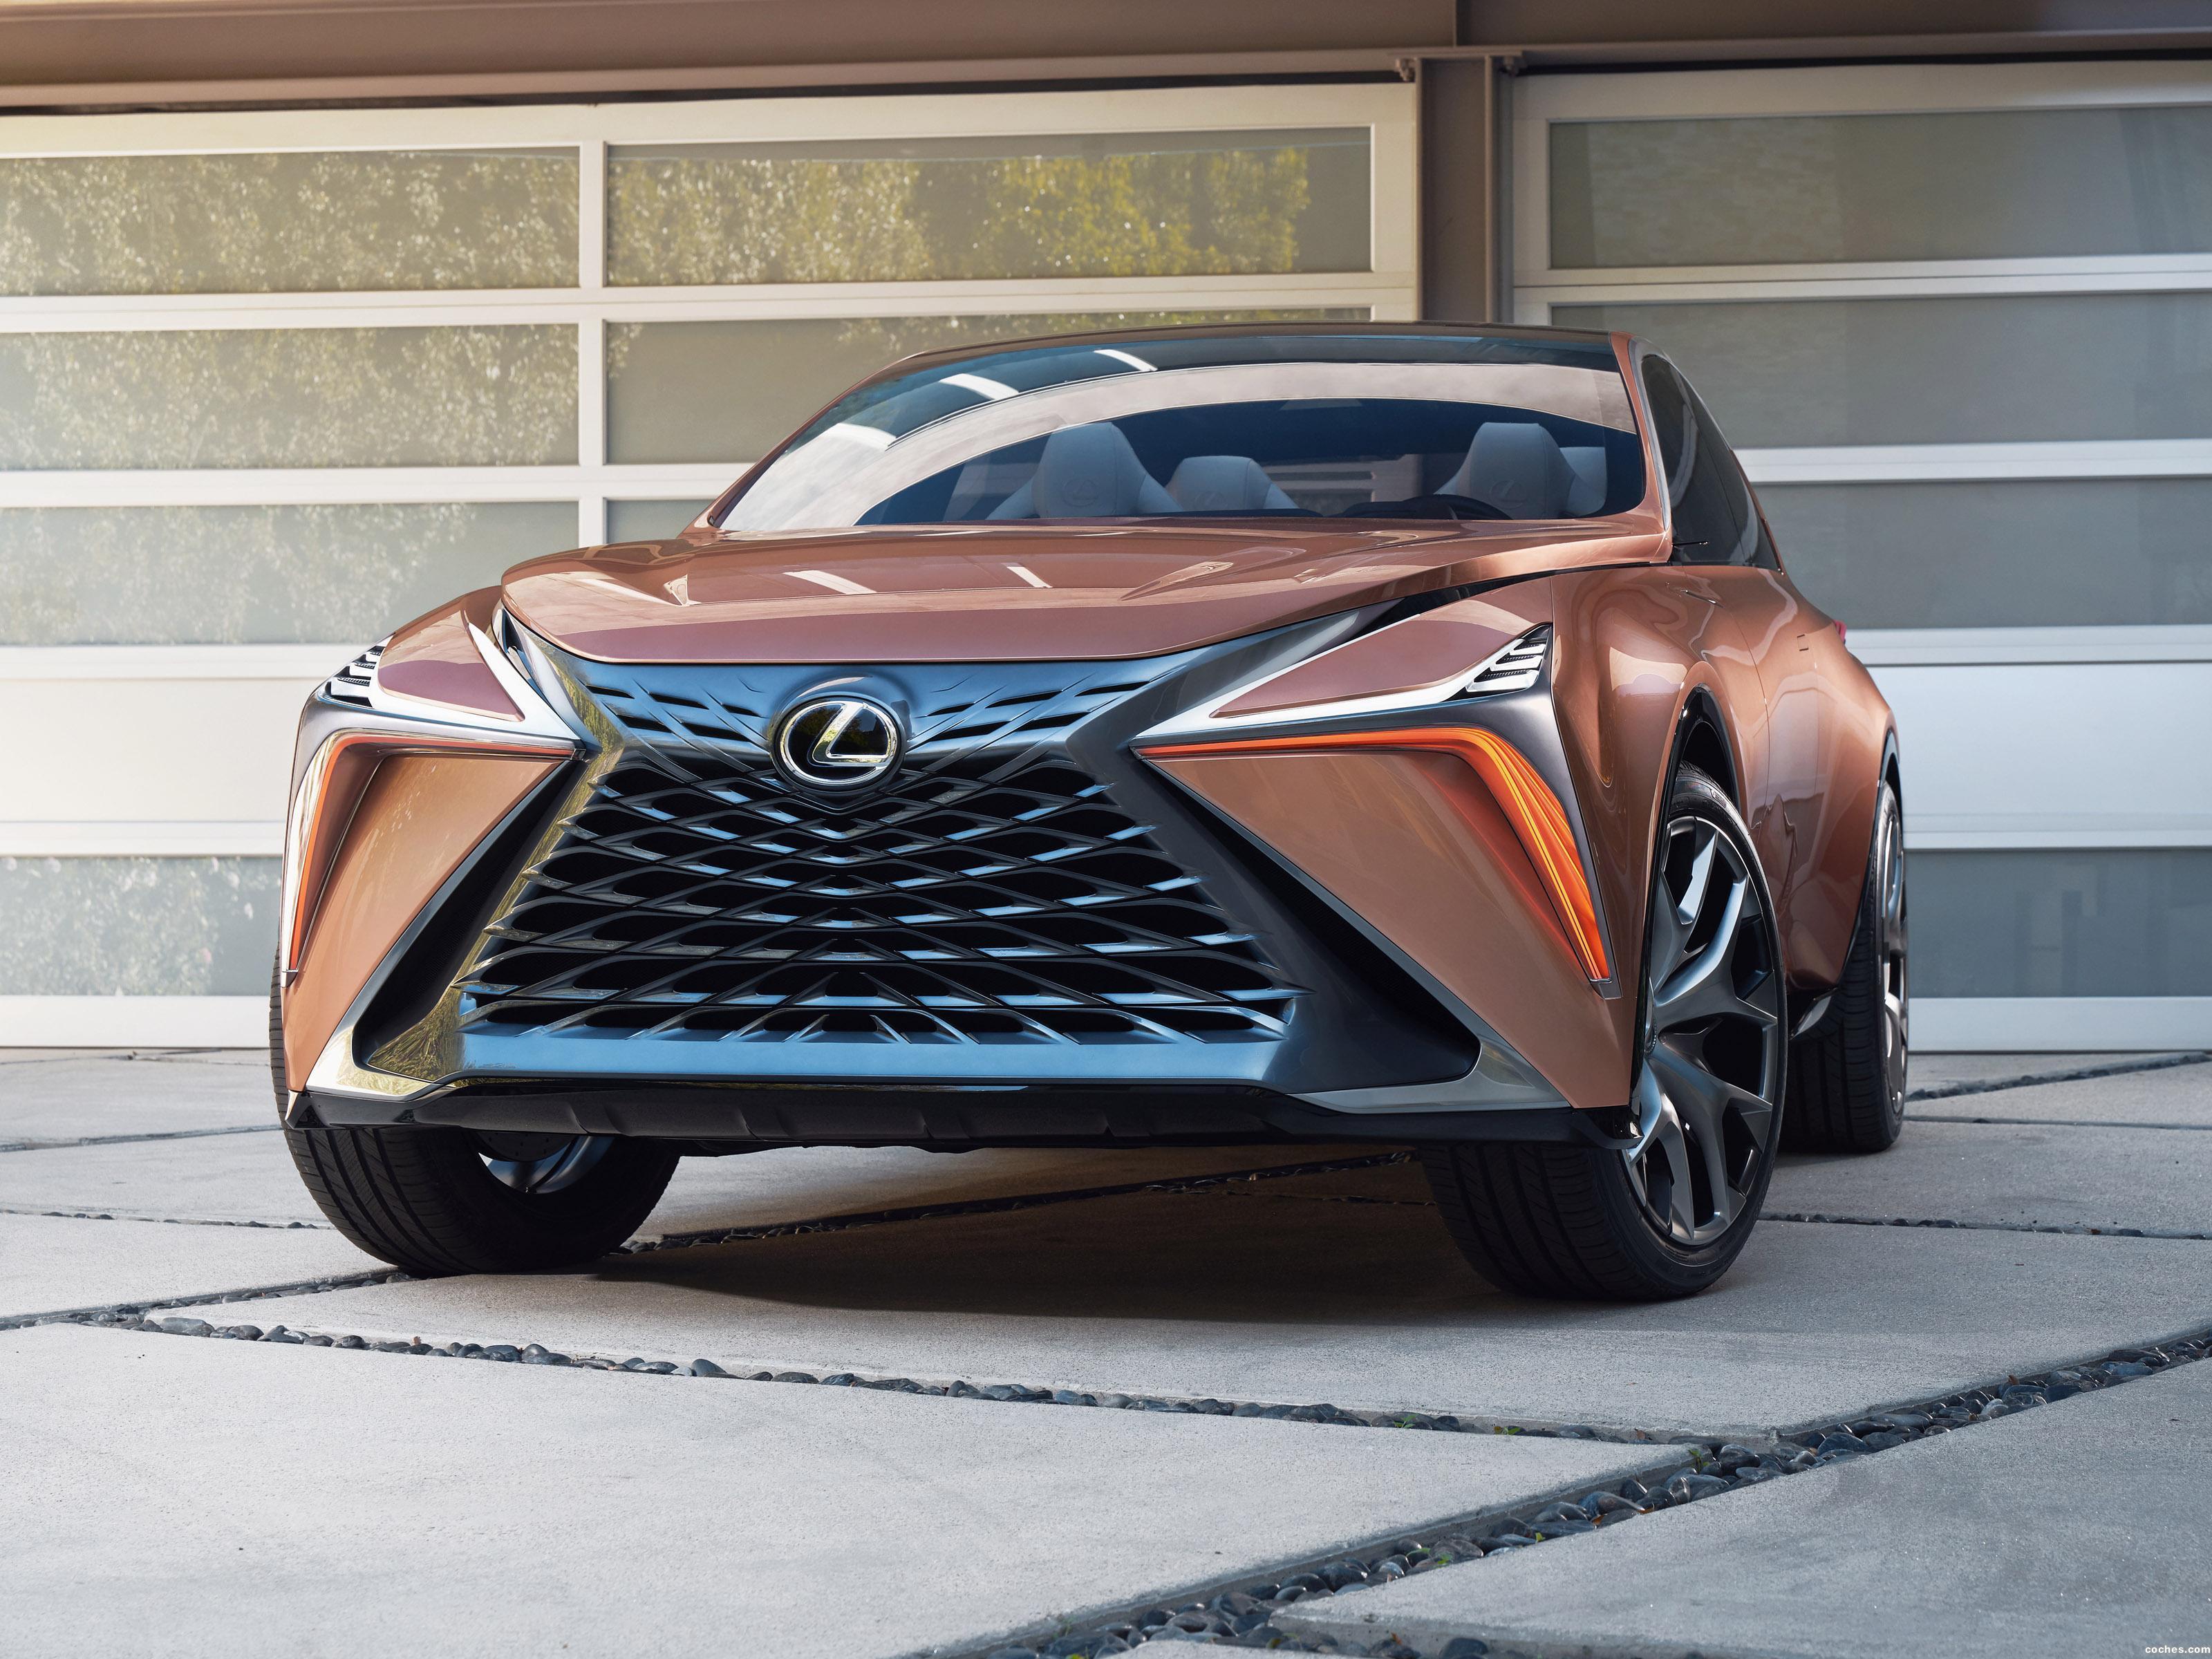 Foto 1 de Lexus LF-1 Limitless 2018